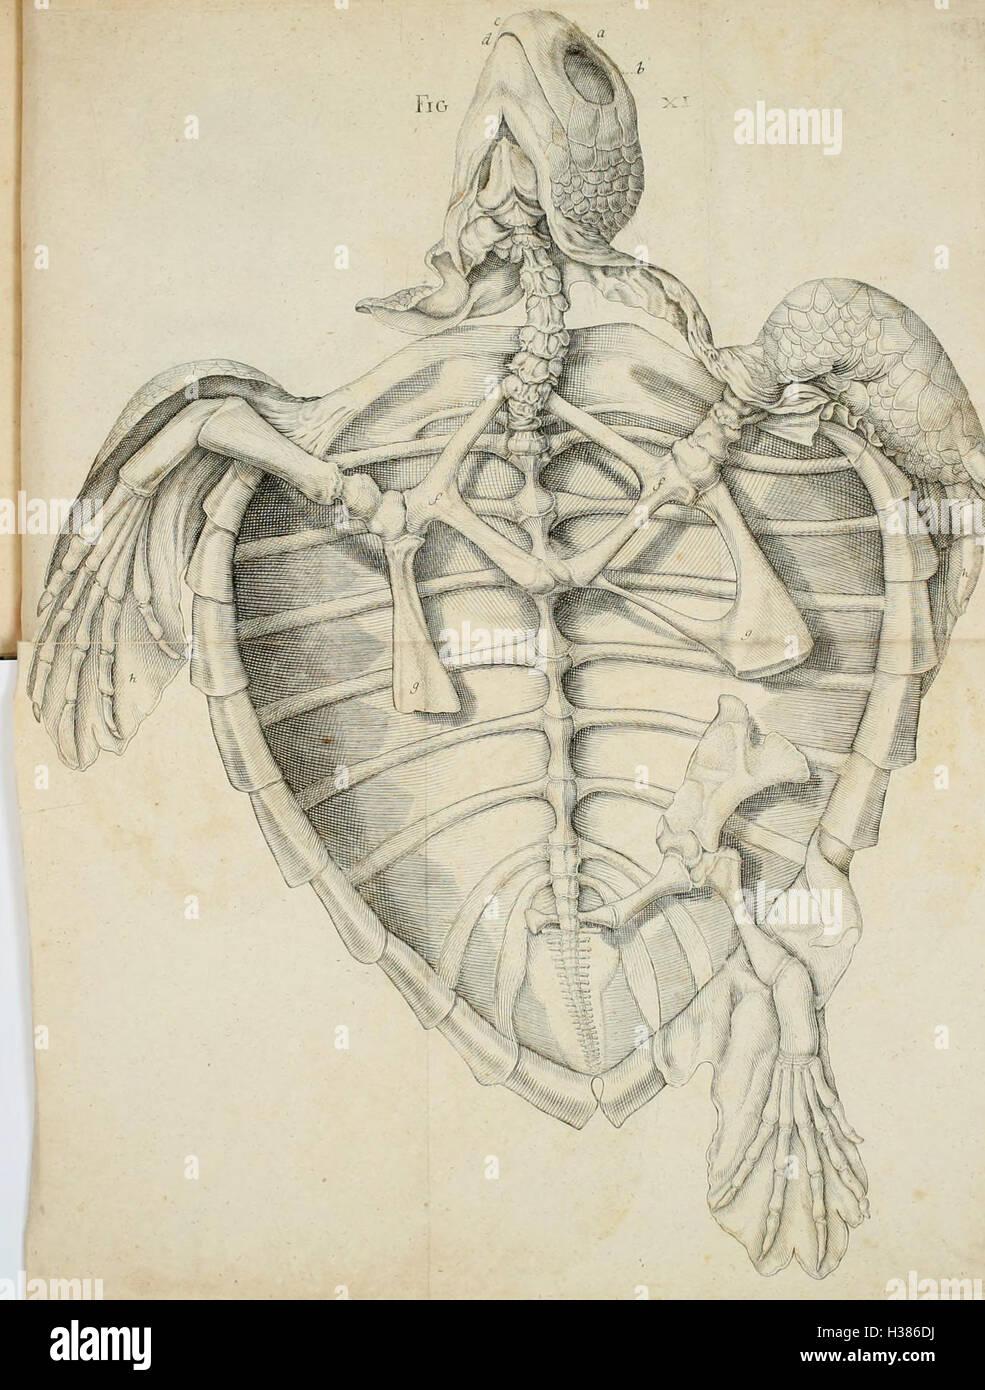 Anatomische Stock Photos & Anatomische Stock Images - Alamy